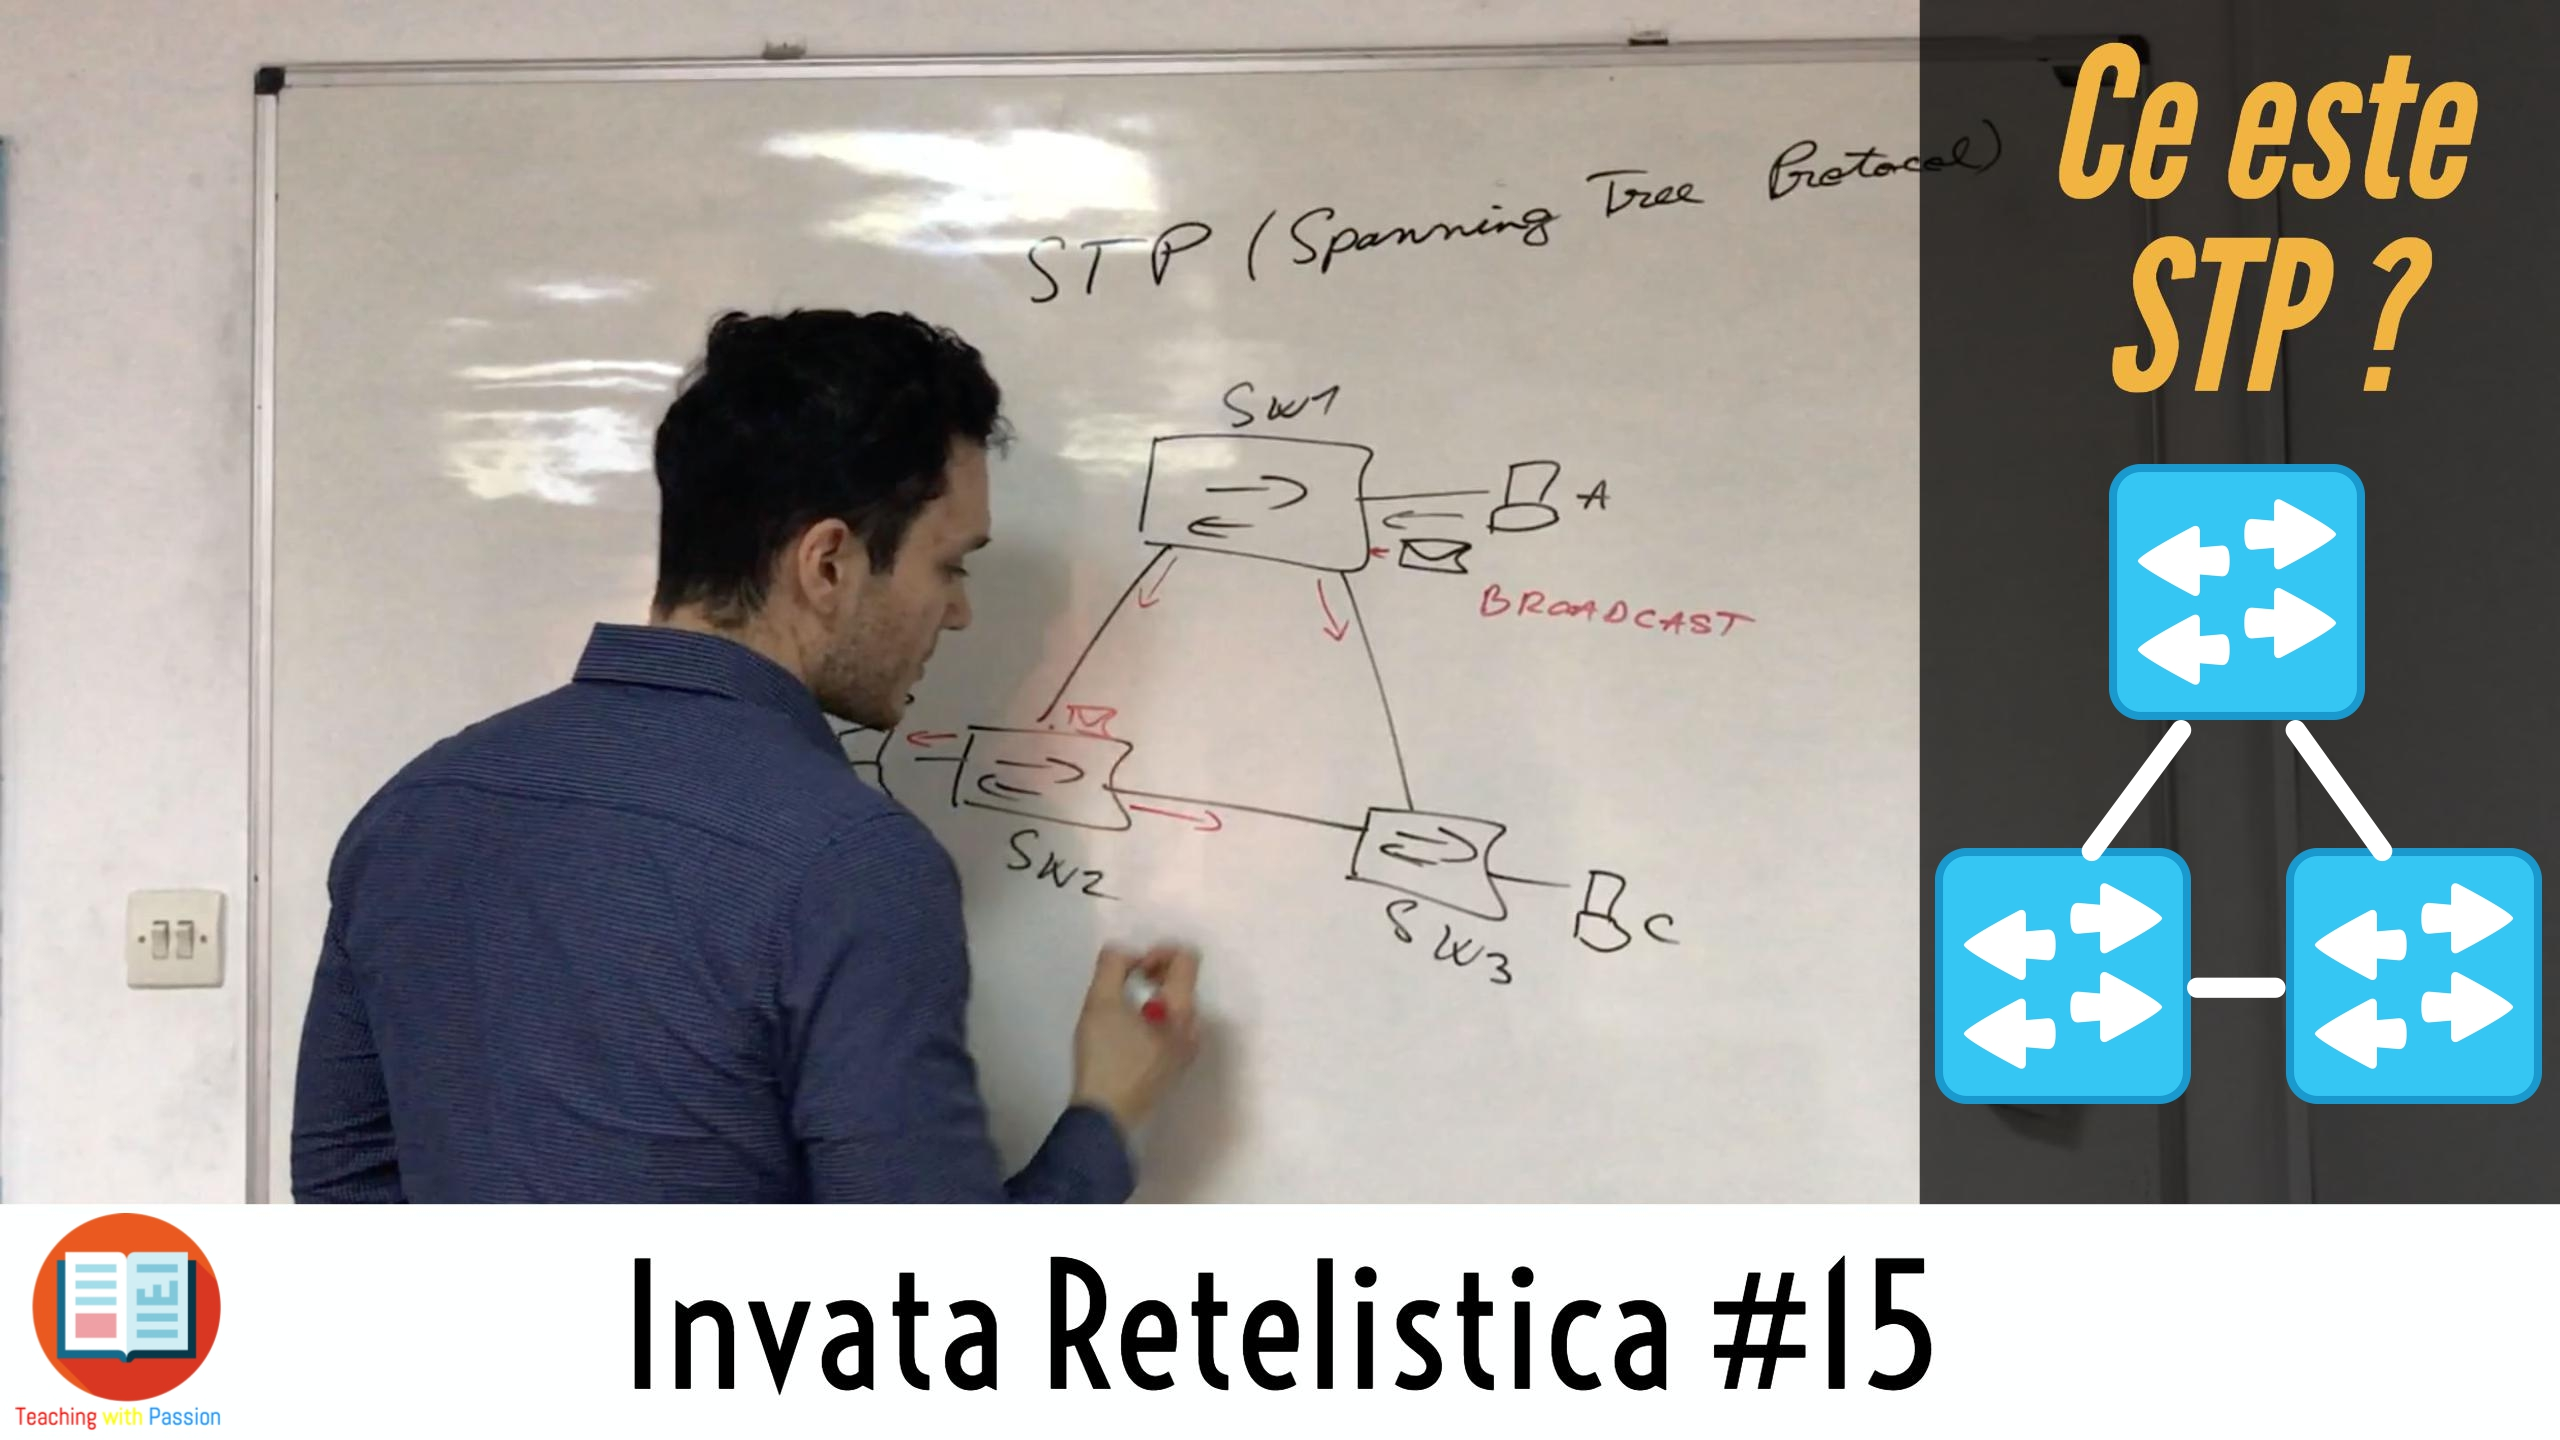 Ce este STP (Spanning-Tree Protocol) si cum Functioneaza pe Switch-uri ? | Invata Retelistica #15